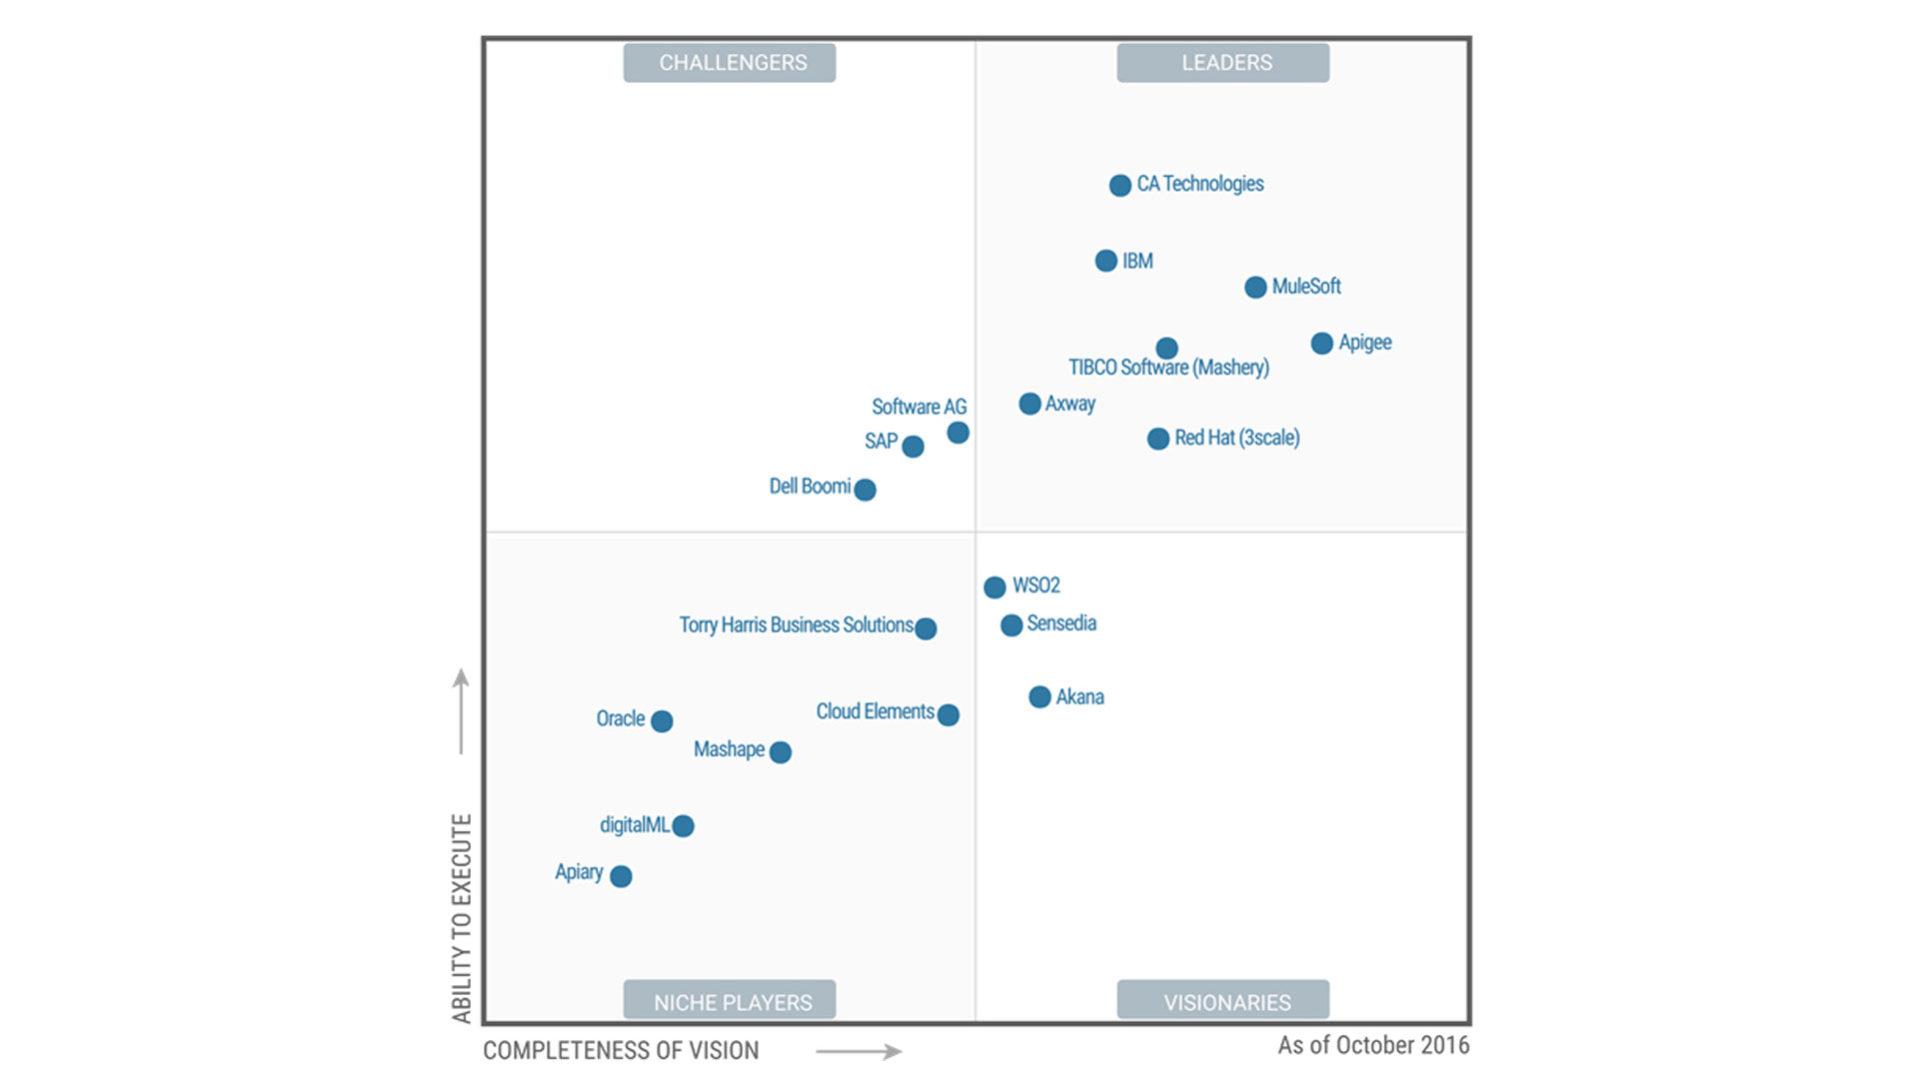 I migliori software di Api management secondo Gartner